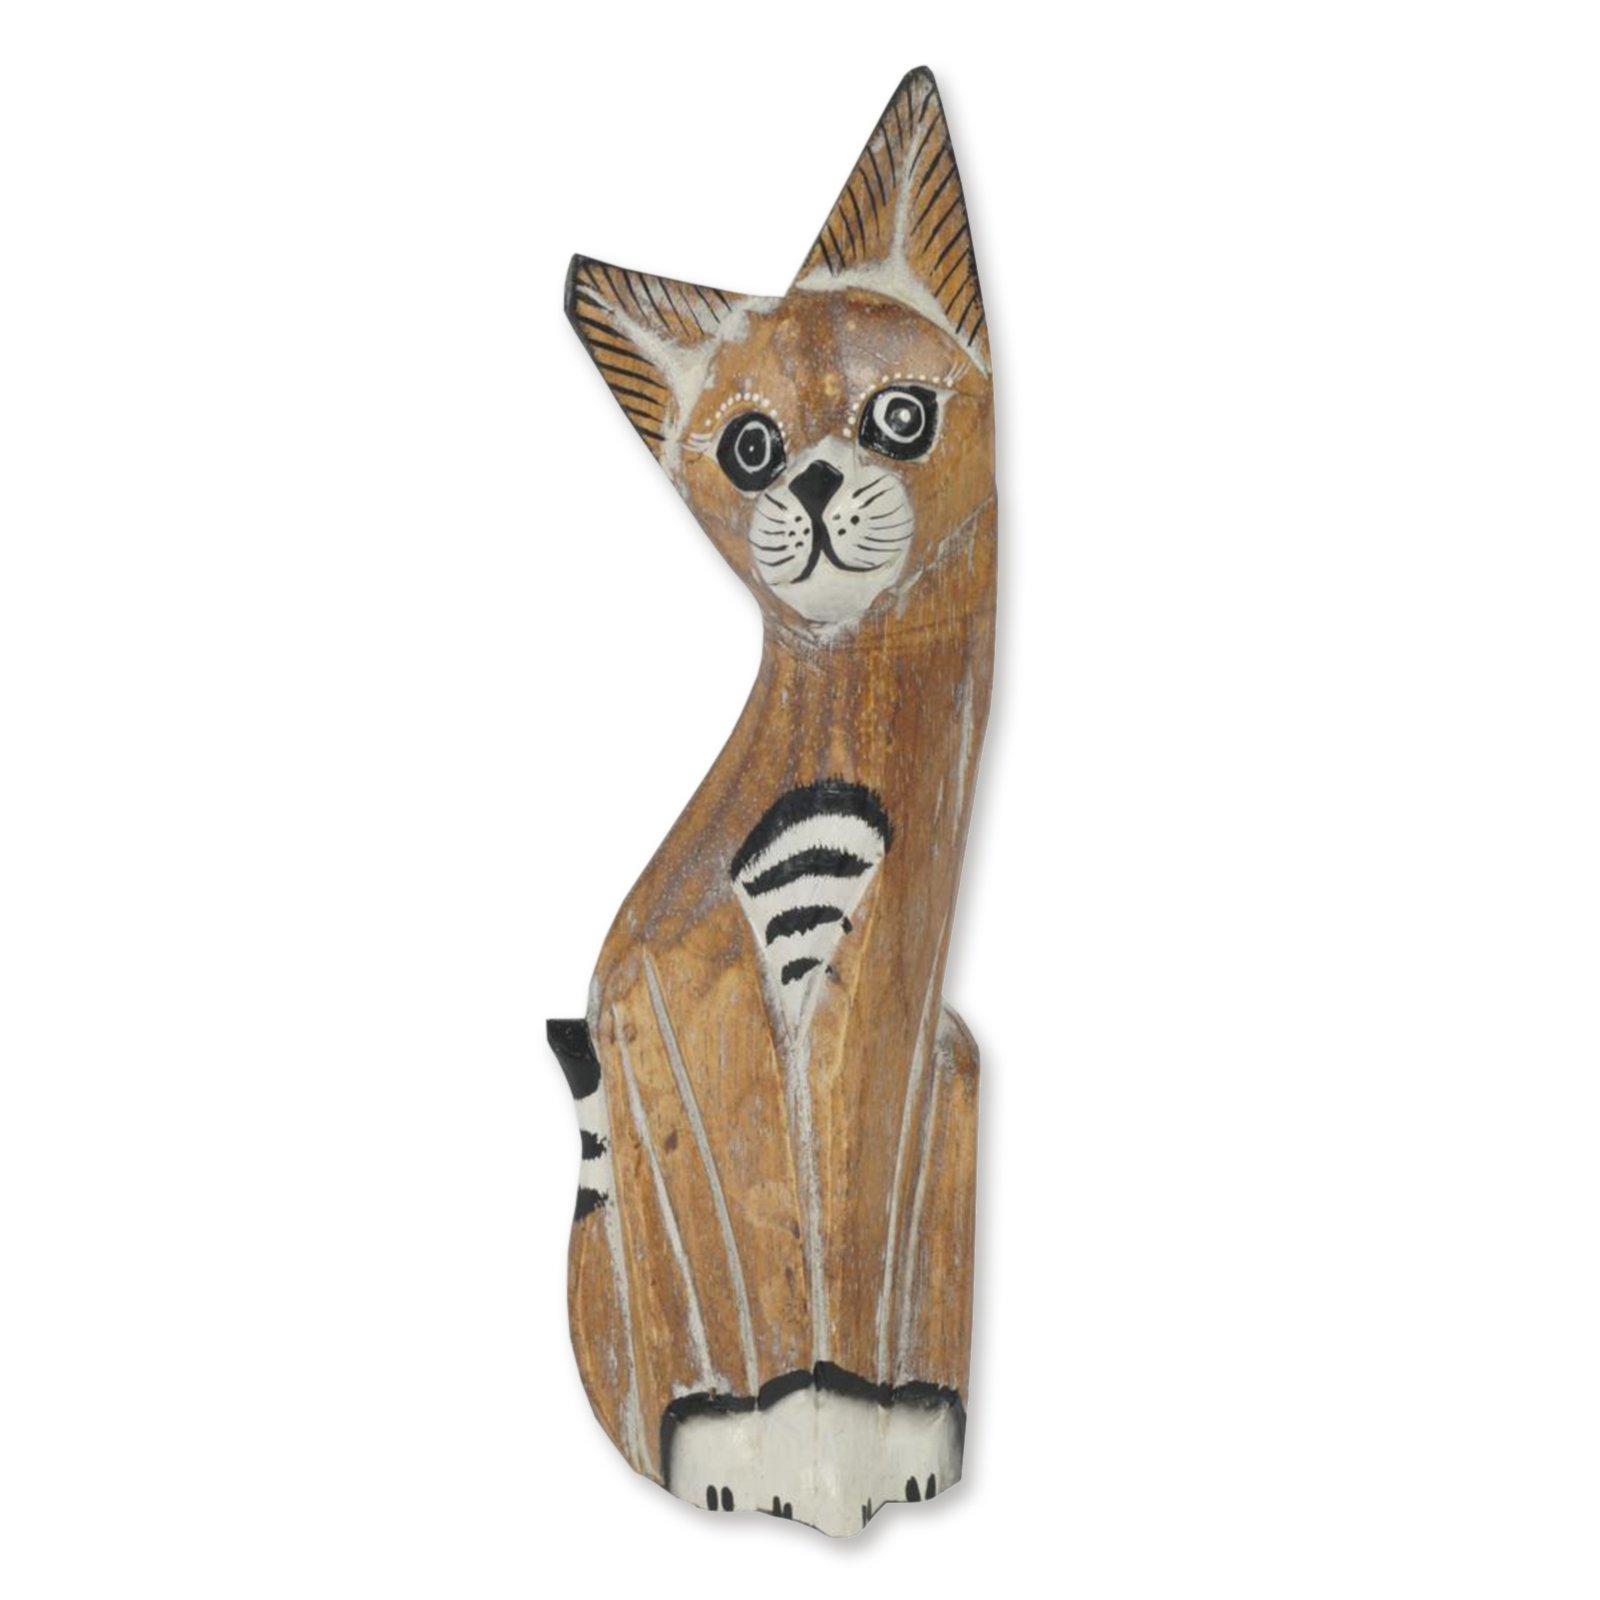 Dekofigur - Katze - Holz - handgeschnitzt - 25 cm